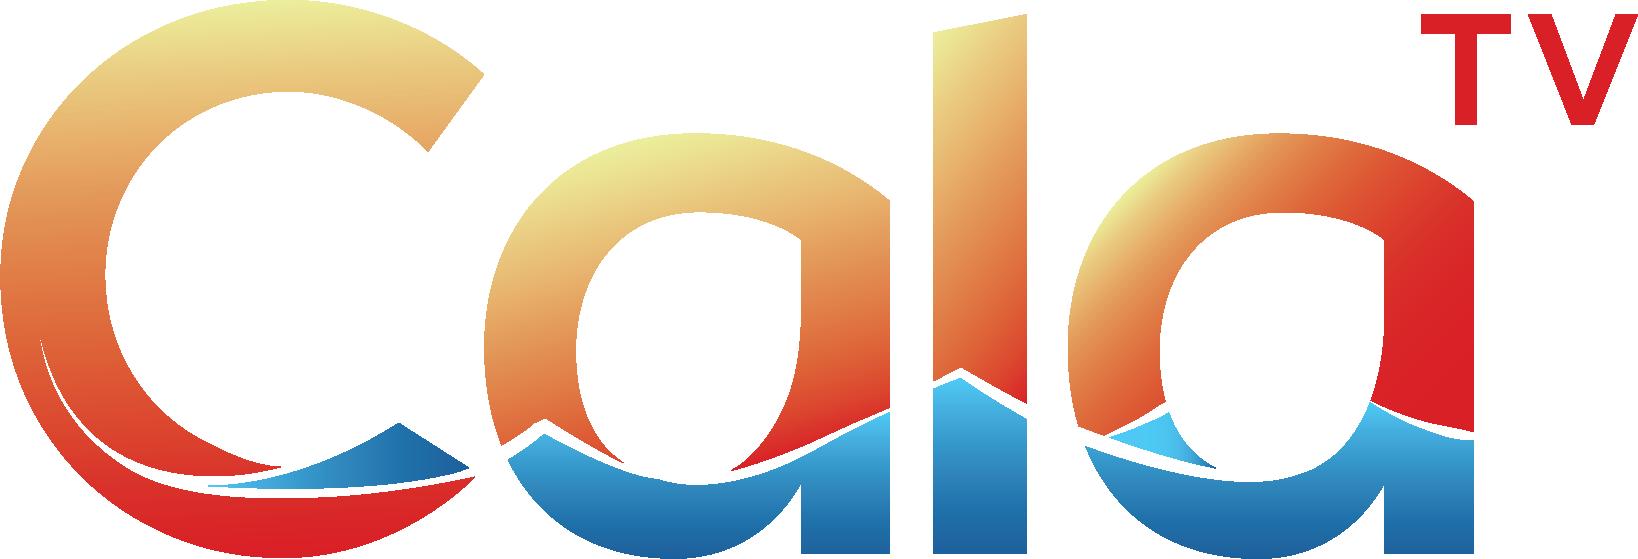 logo - CalaTV